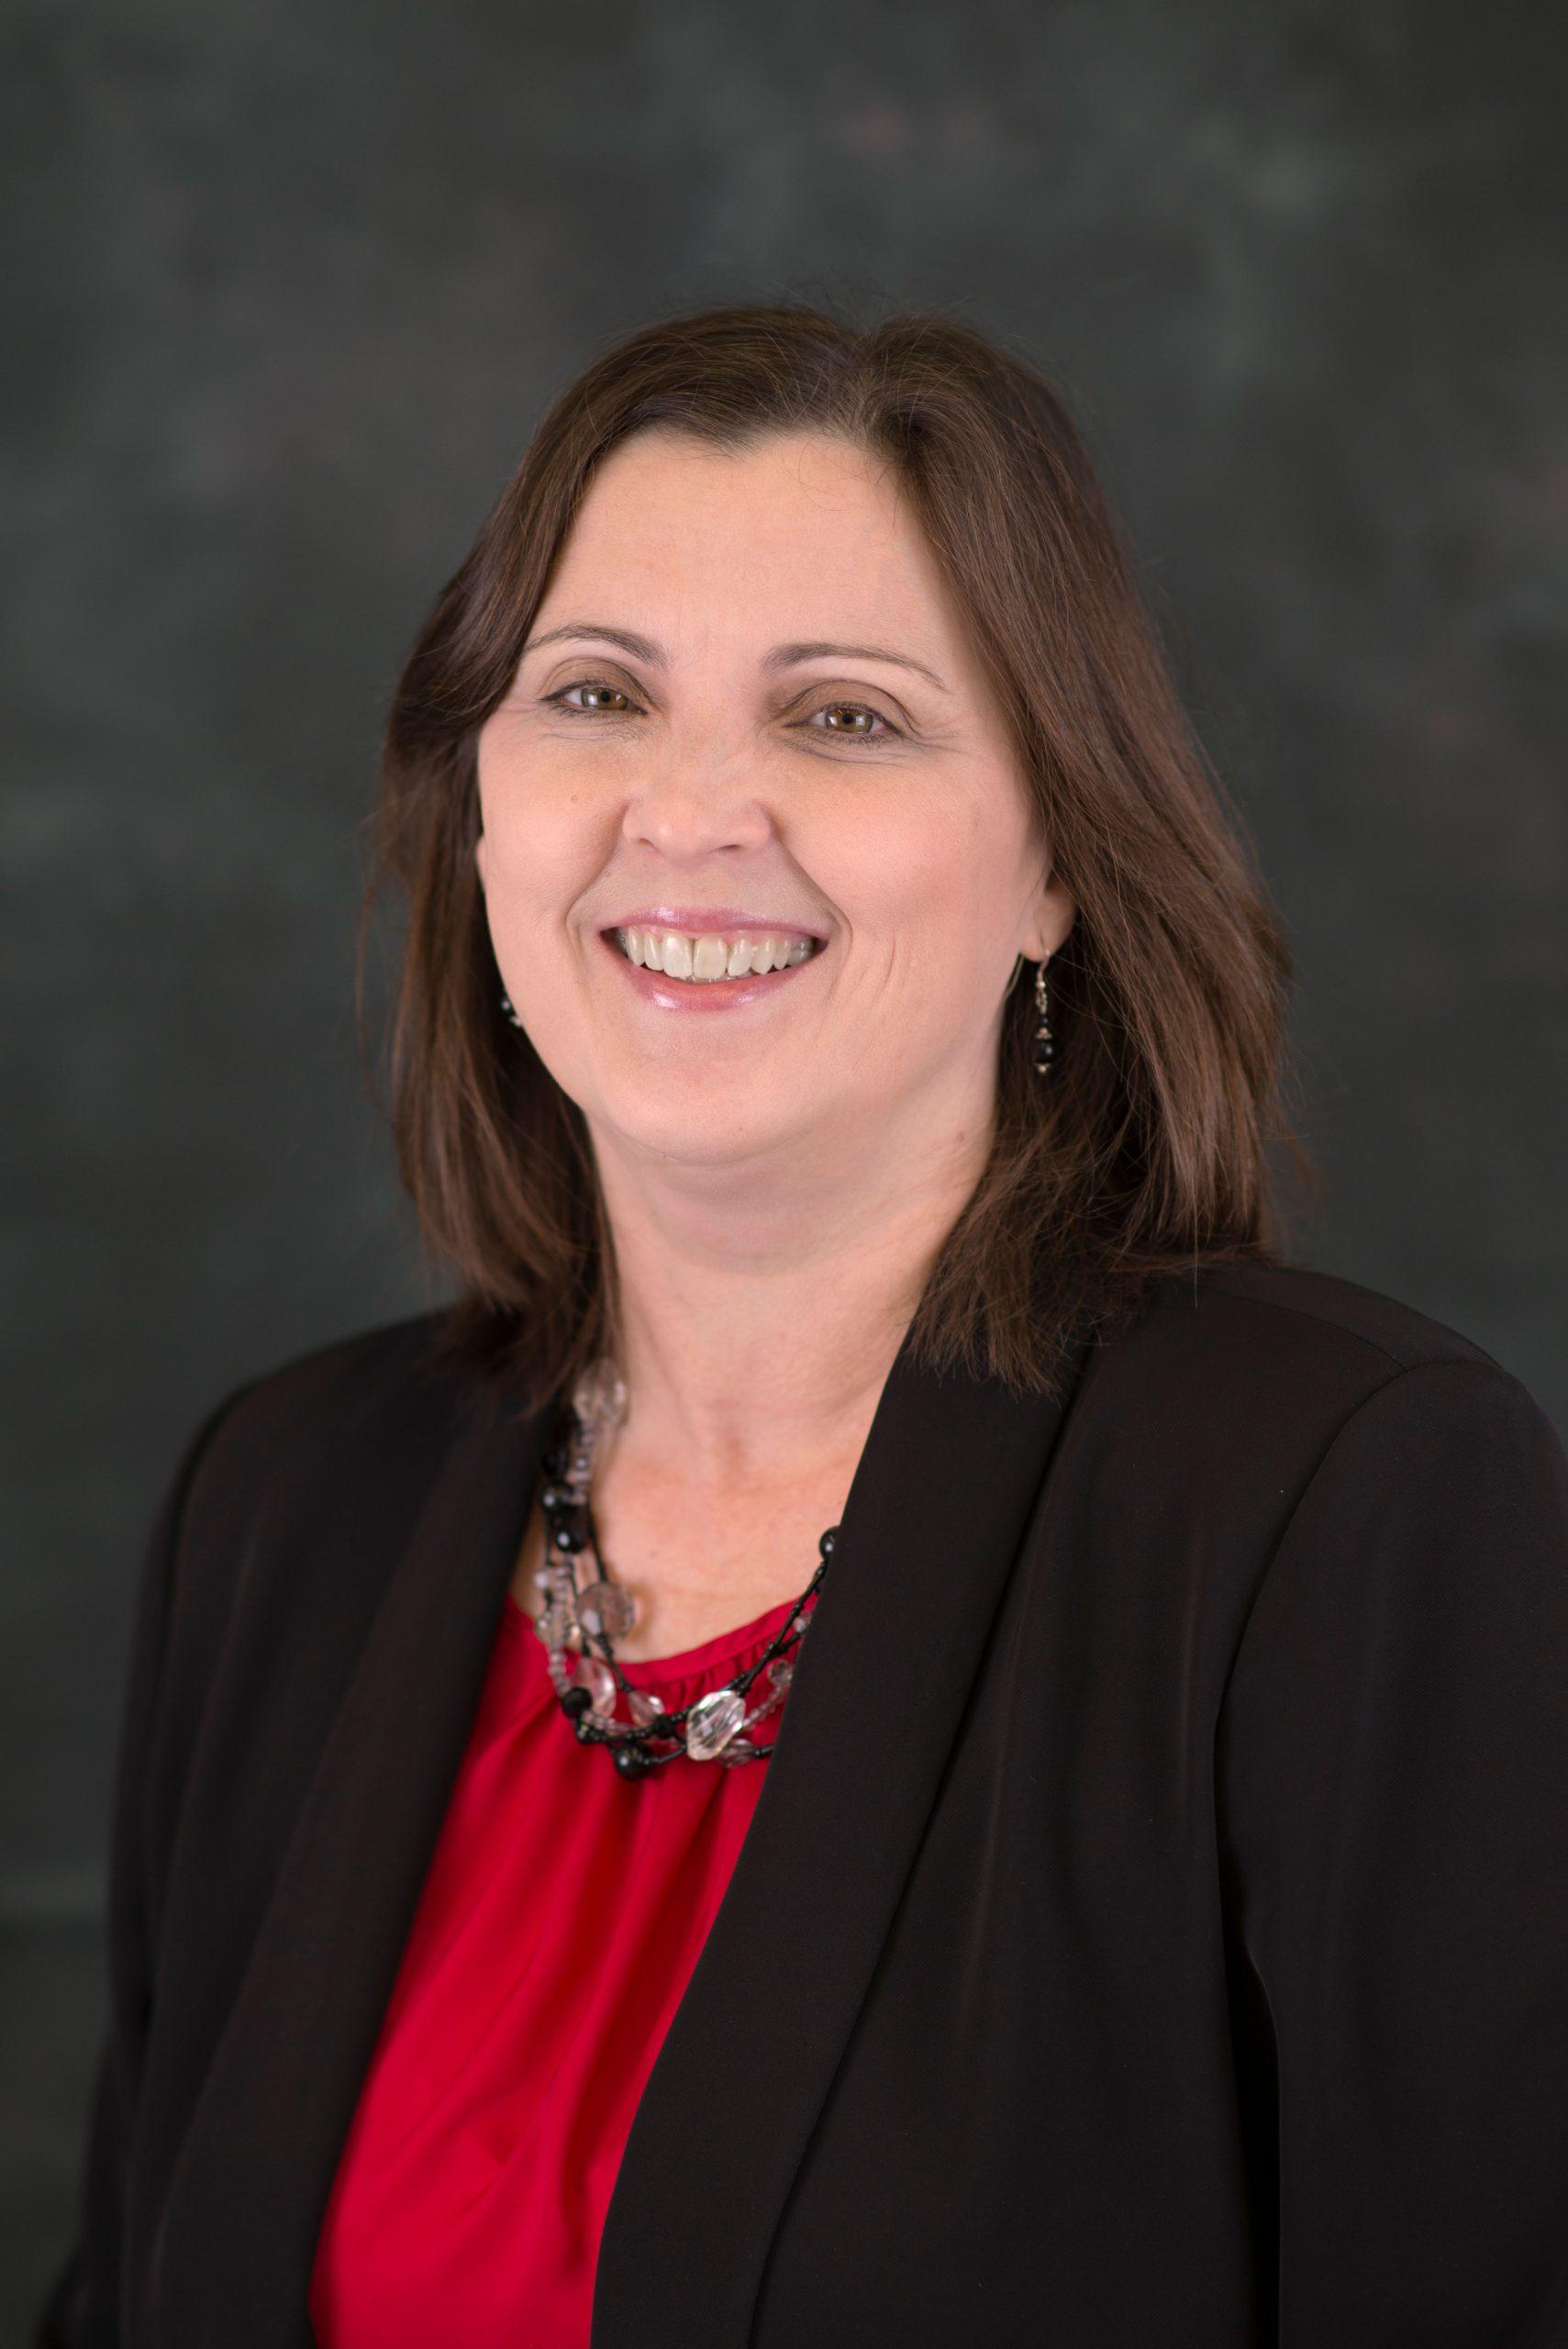 Pam Stinson, Ph.D.